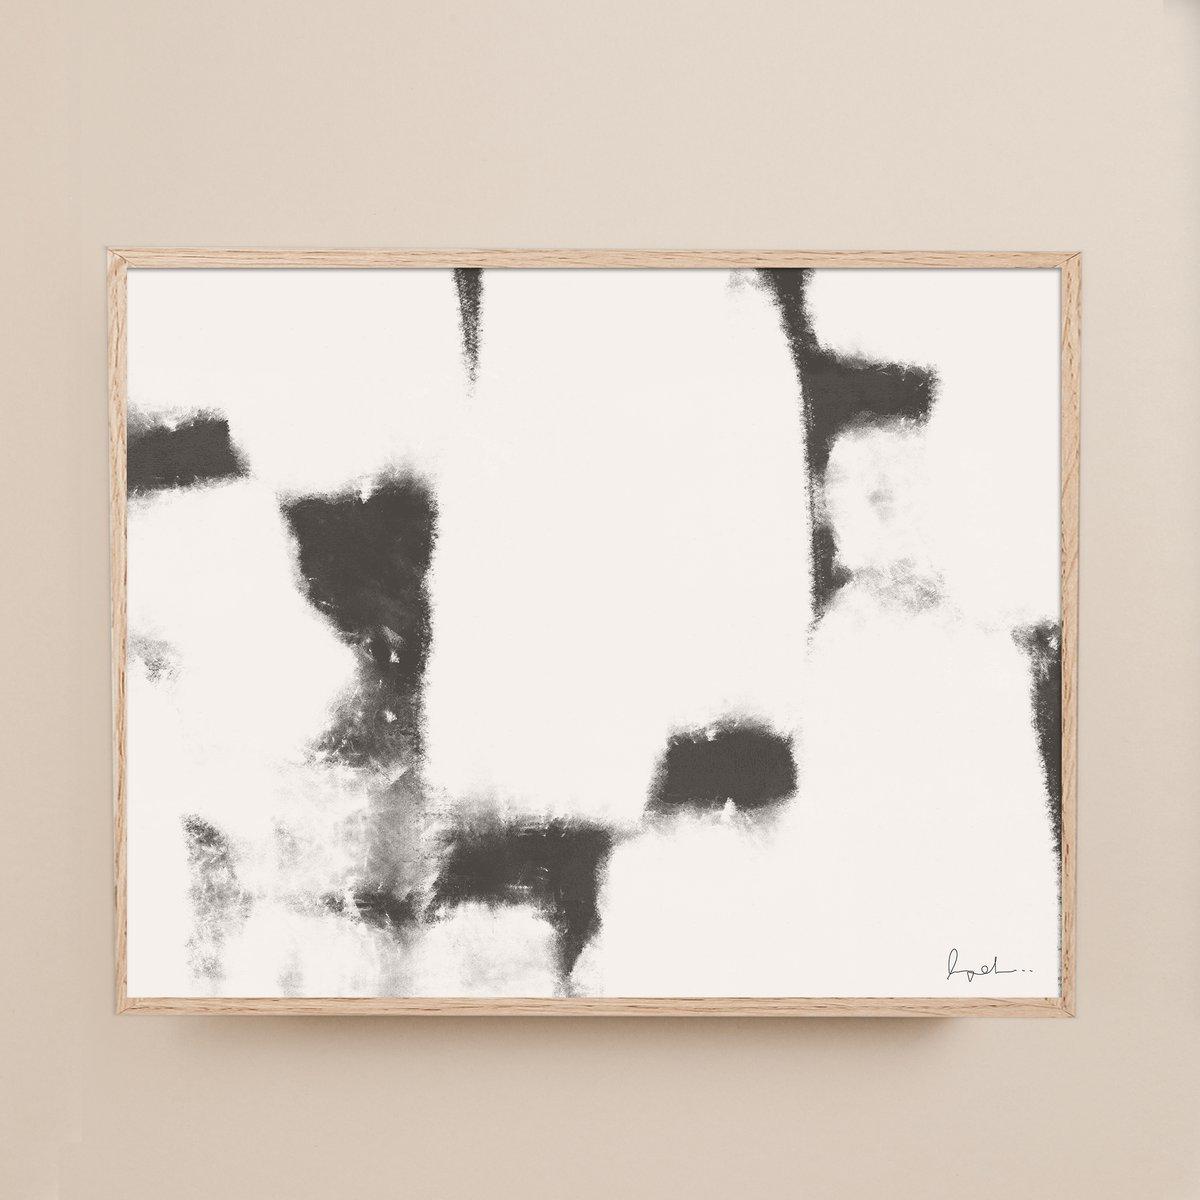 New Artwork Modern Abstract Art - Instant Download  https://t.co/vBfvQ3ruiM  #abstractart #printables #blackwhite #etsy #etsyshop #homedecor #interiordecor #interiordesign #interiordesigner #homestyling #etsyfinds #modernhome #artprint #scandinavianhomes https://t.co/qy8P95BPU6